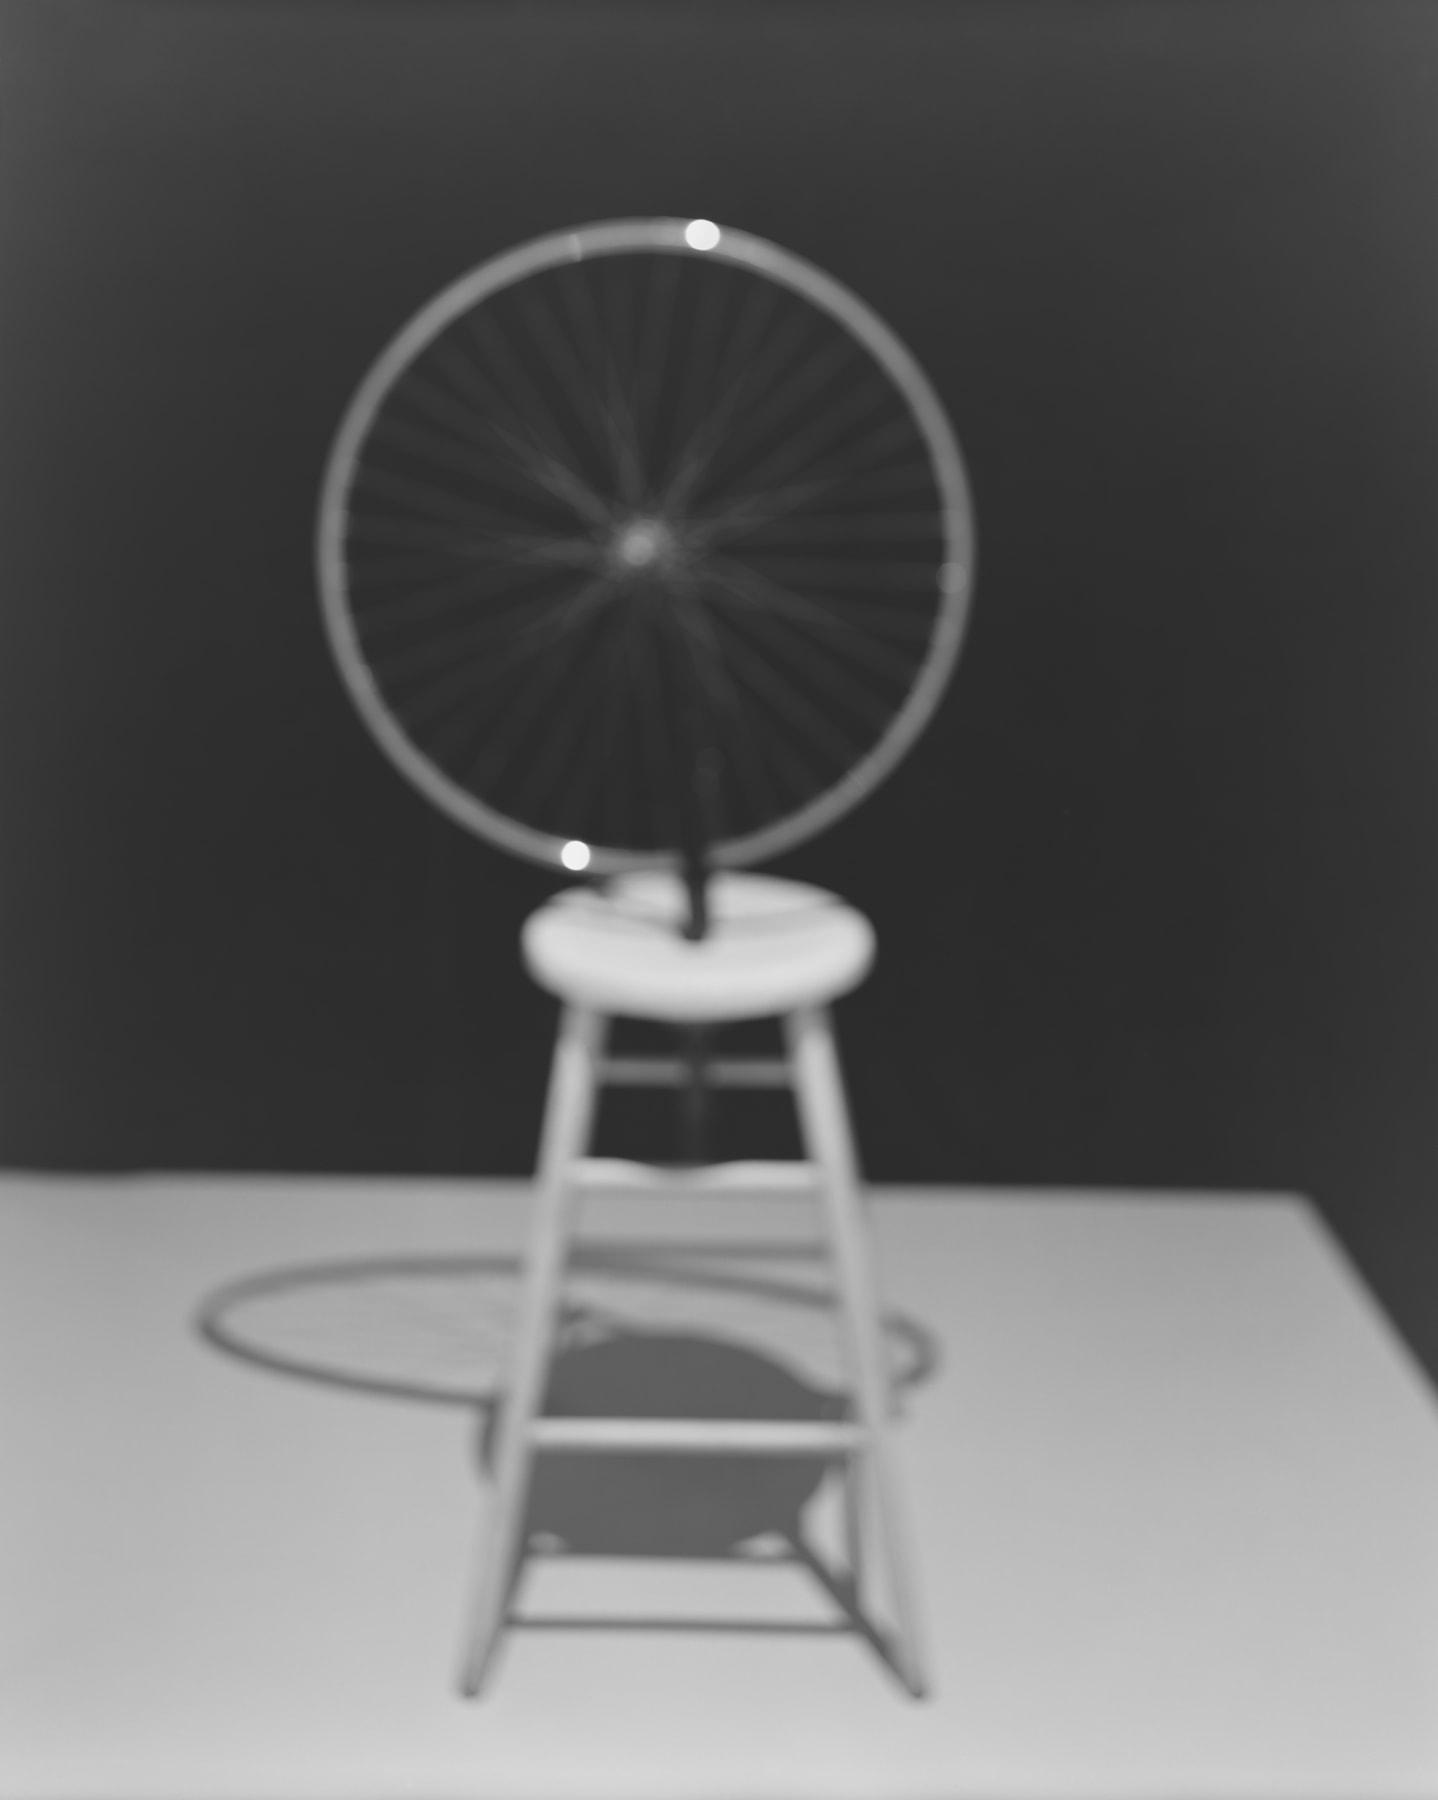 Hiroshi Sugimoto, Past Presence 025, Bicycle Wheel, Marcel Duchamp, 2014